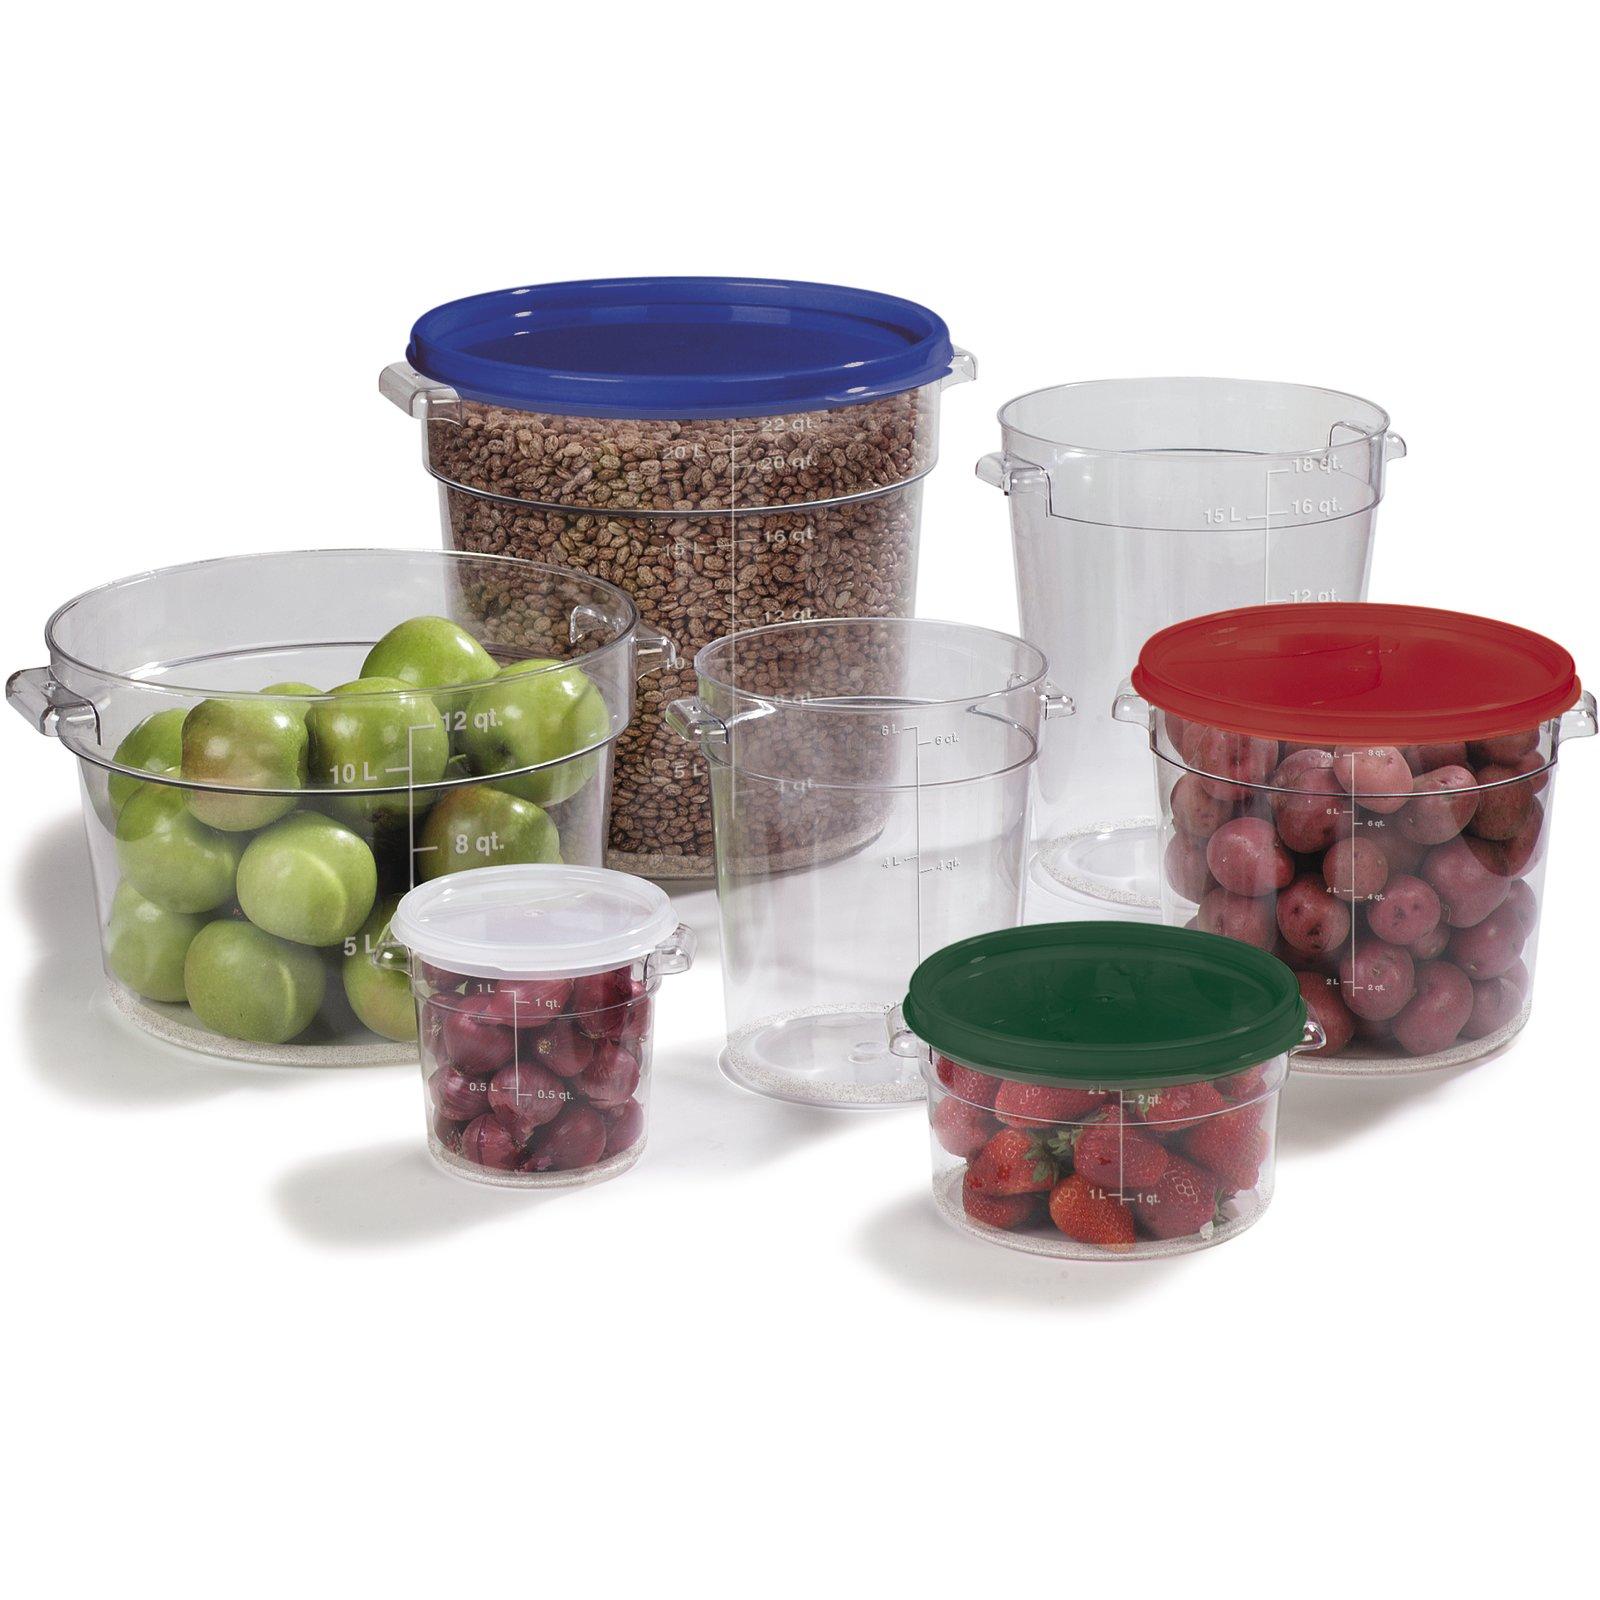 1076707 StorPlus Polycarbonate Round Food Storage Container 12 qt